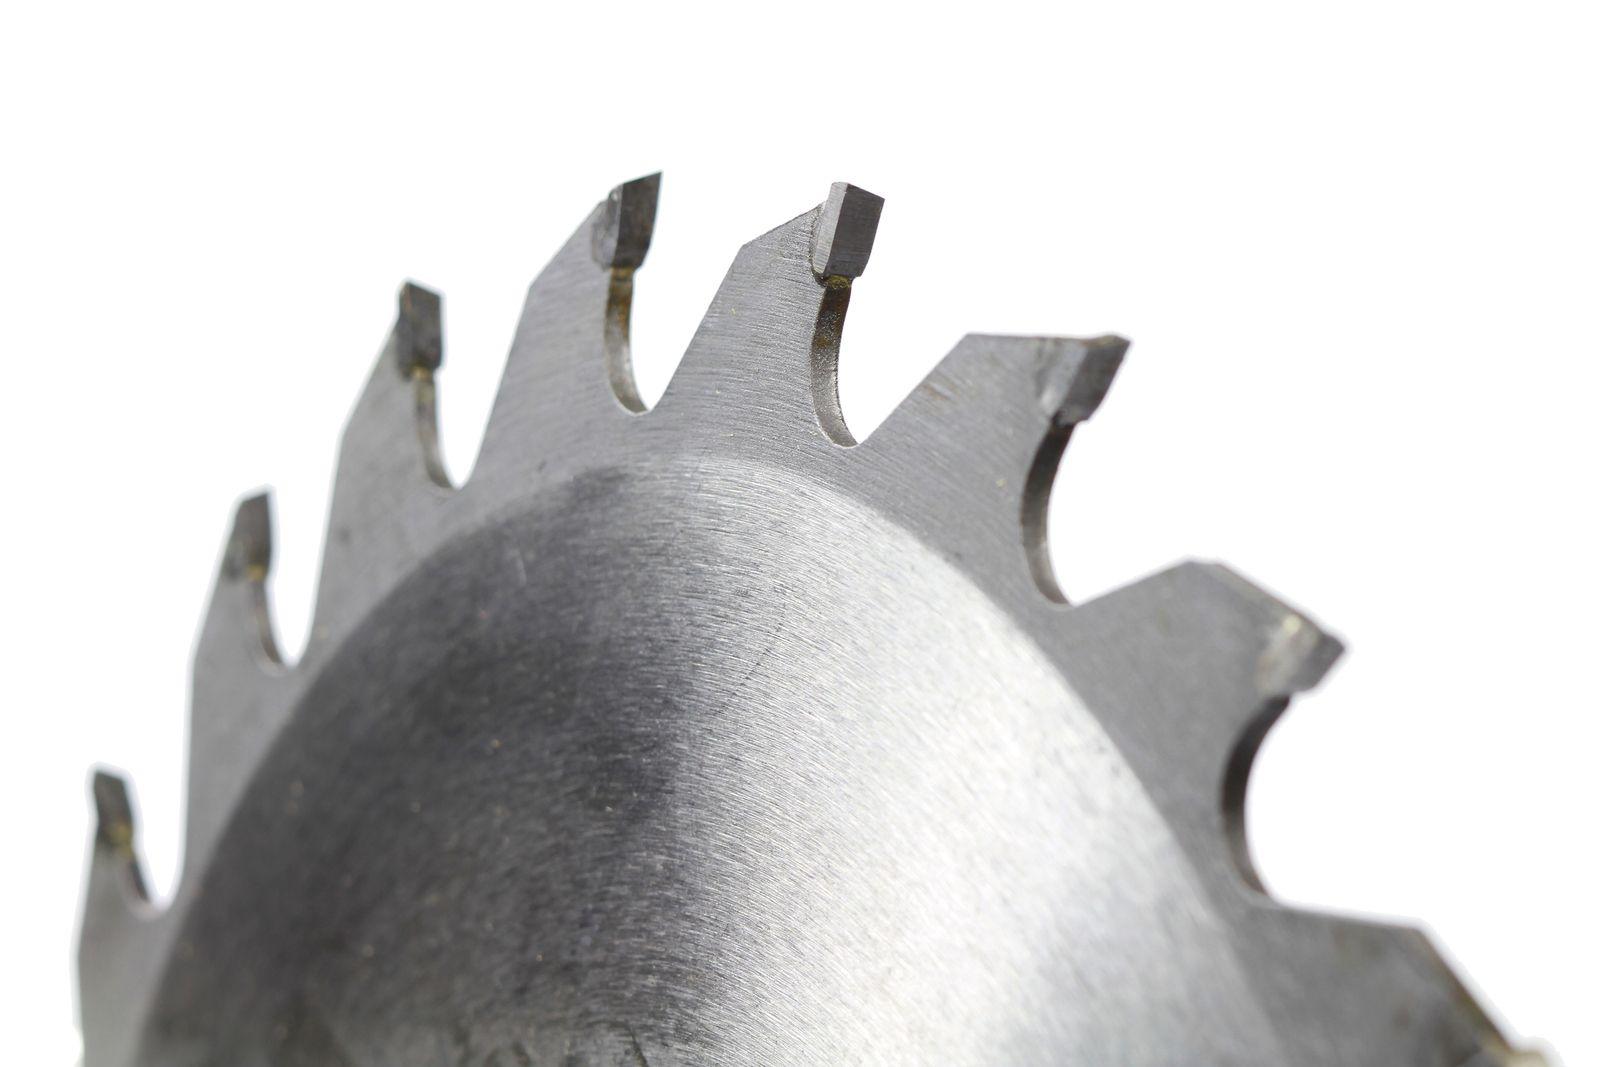 120 Volt Circular Saw Blade Sharpener Multiple Durable Lightweight Tilt Tooth